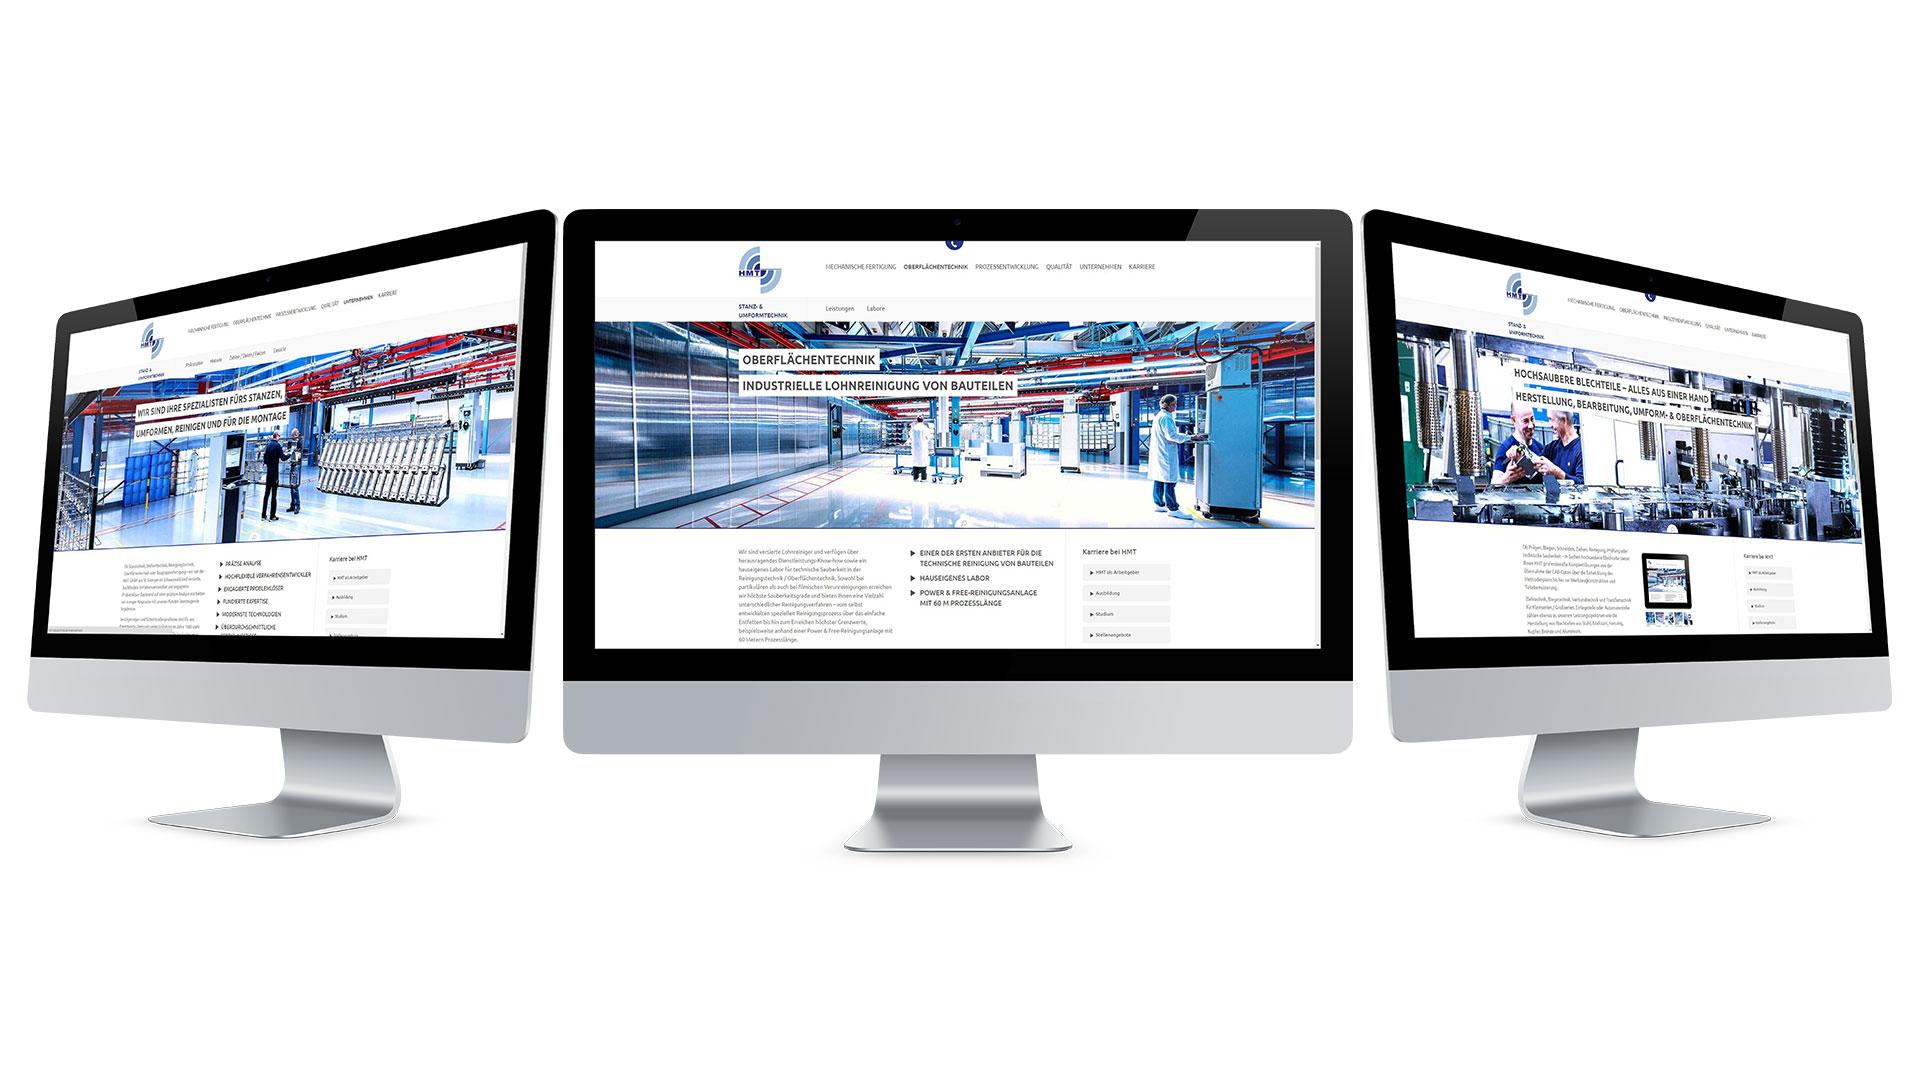 HMT – HÄSELER METALL TECHNIK GMBH Web